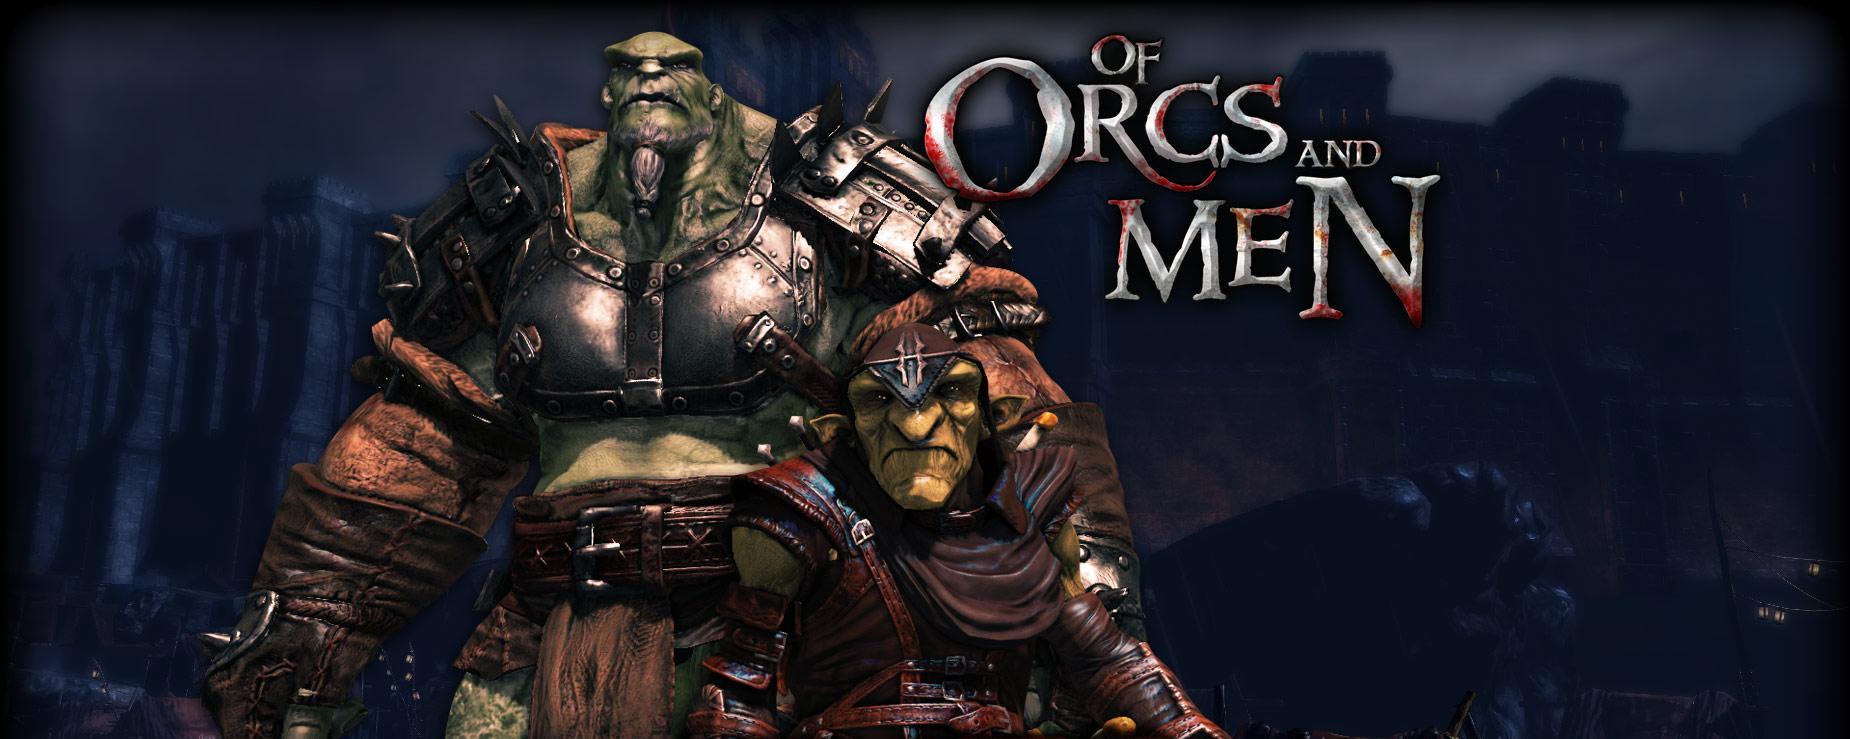 of orcs and men logo